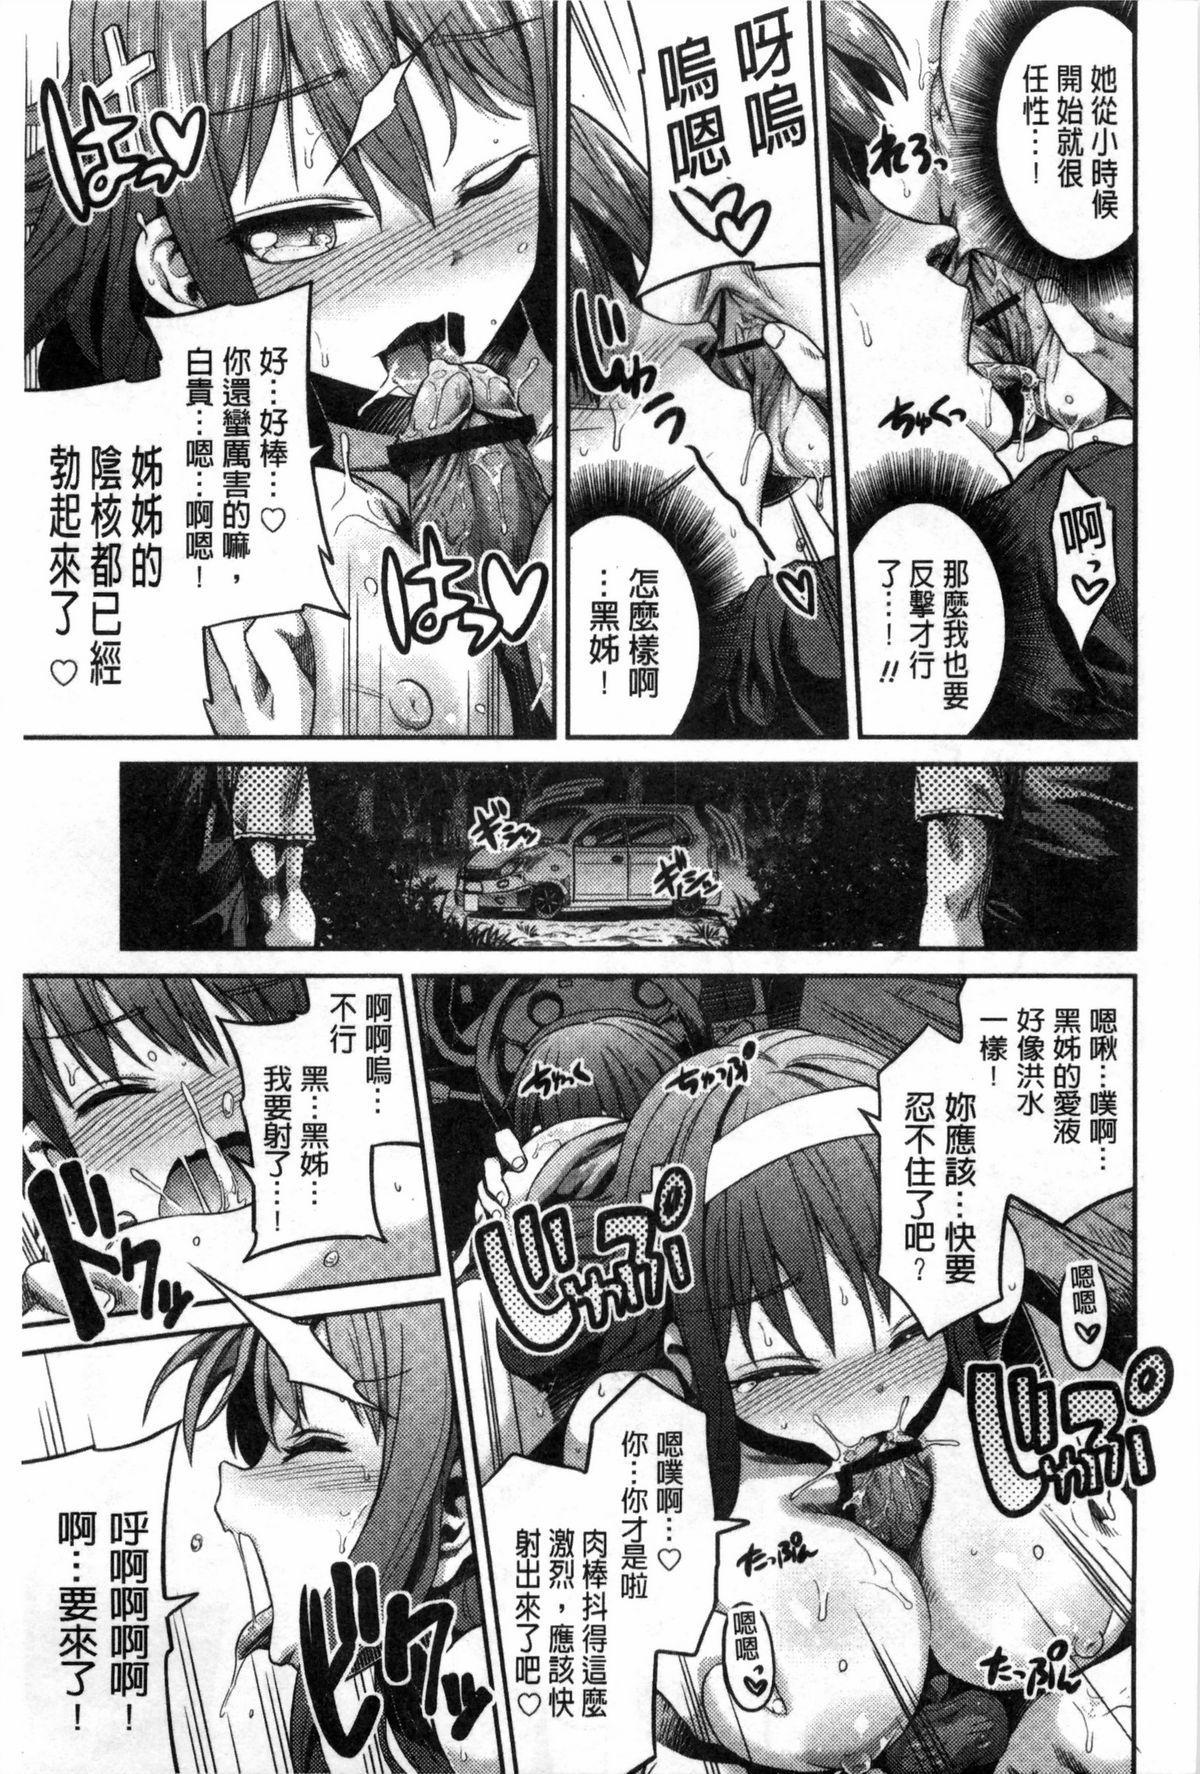 Man x Koi - Ero Manga de Hajimaru Koi no Plot   A漫×戀情 由情色漫畫所萌生的戀之物語 141